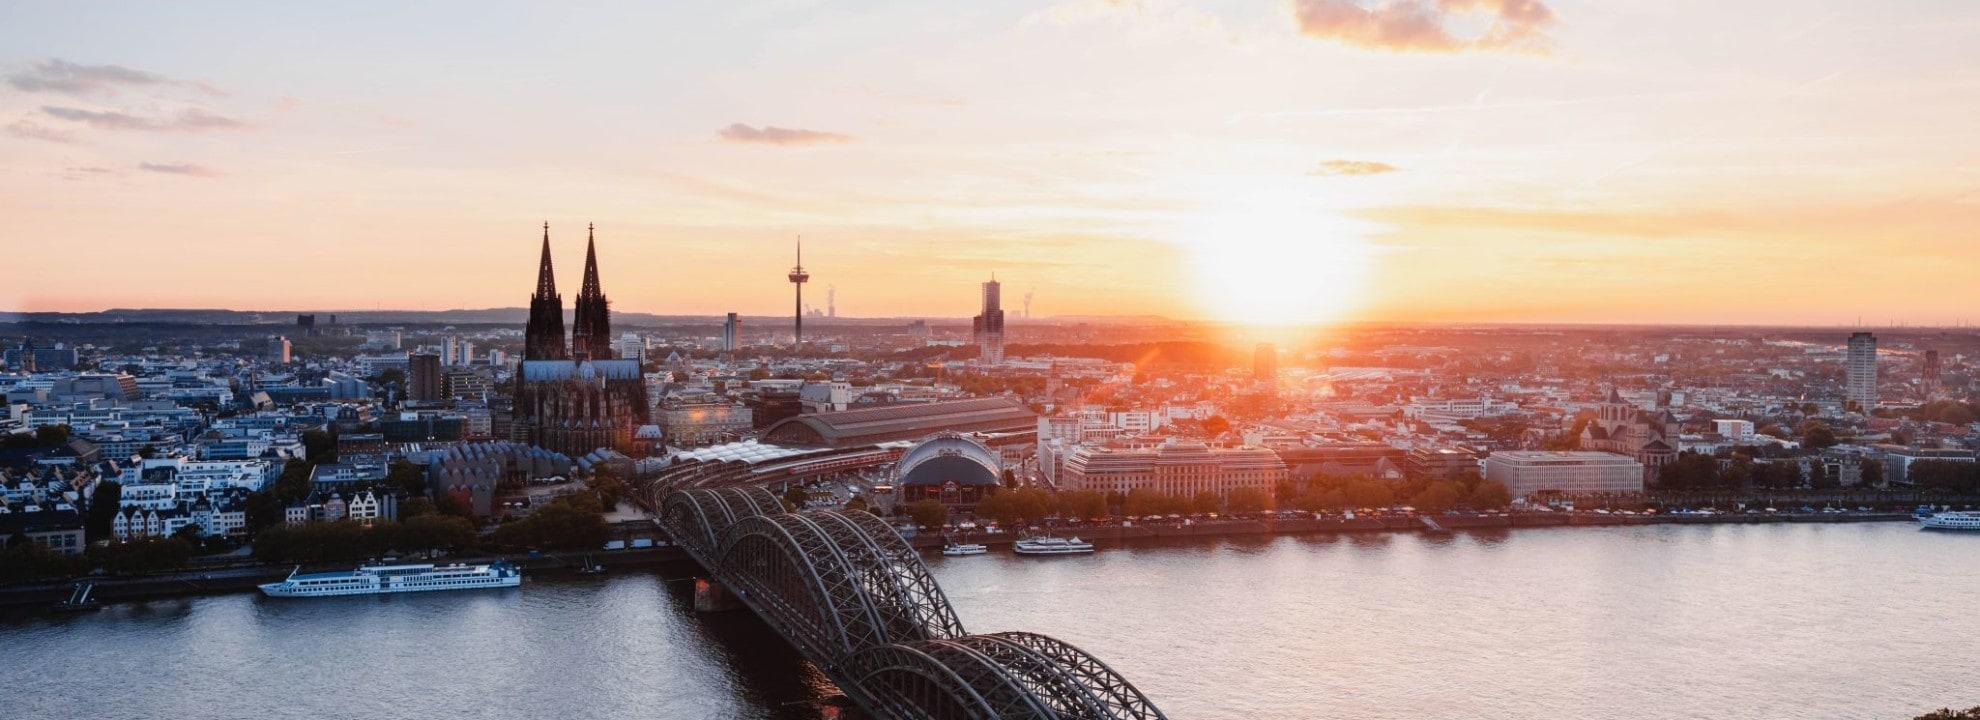 Laravel Agentur Köln